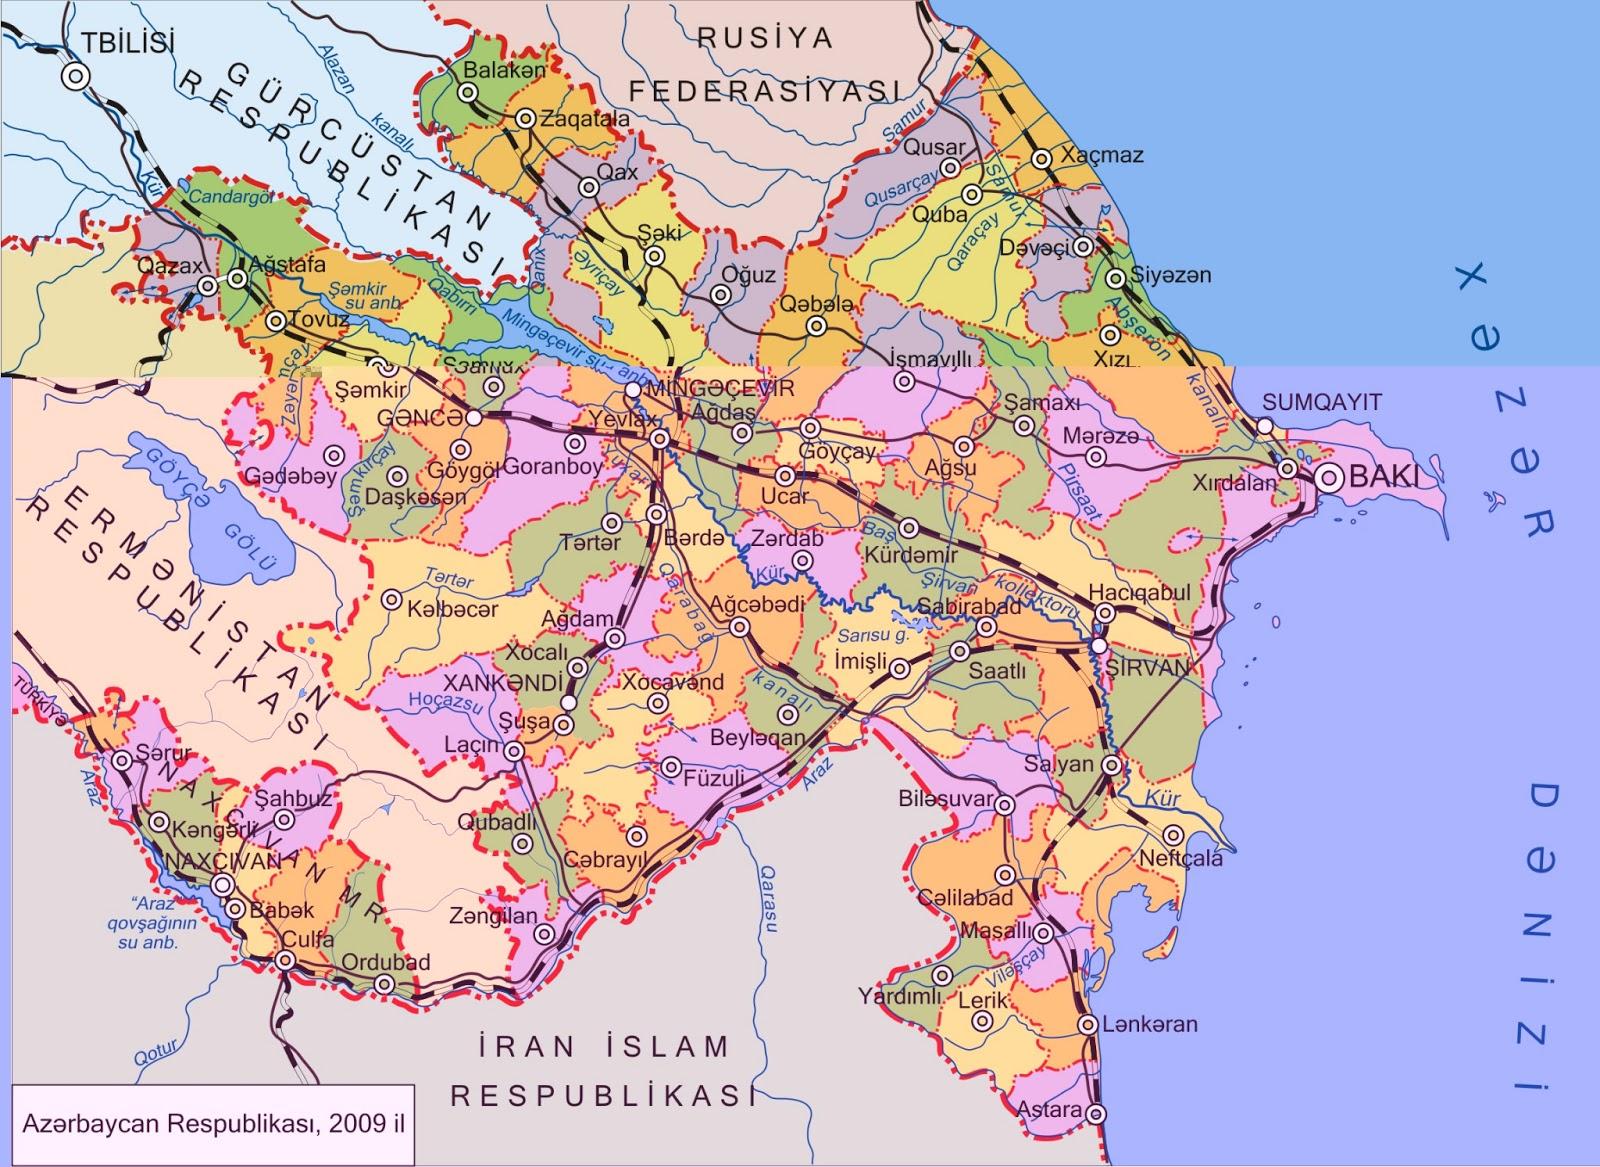 Azerbaijão | Mapas Geográficos do Azerbaijão